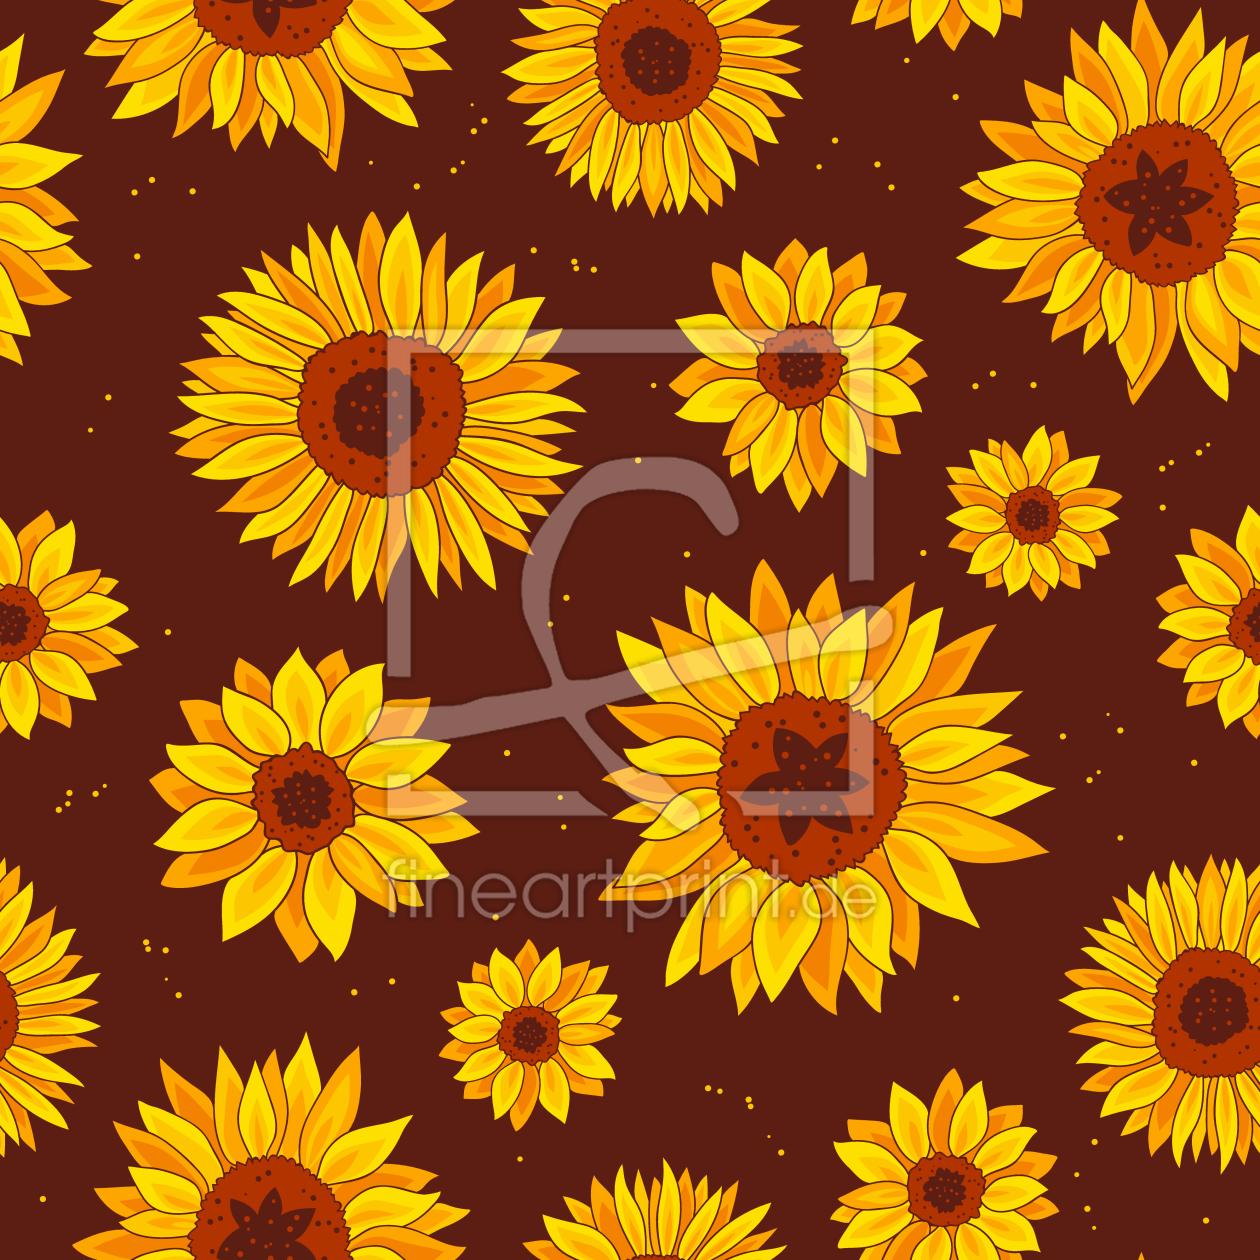 gelbe kamille als fensterfolie von patterndesigns com e. Black Bedroom Furniture Sets. Home Design Ideas